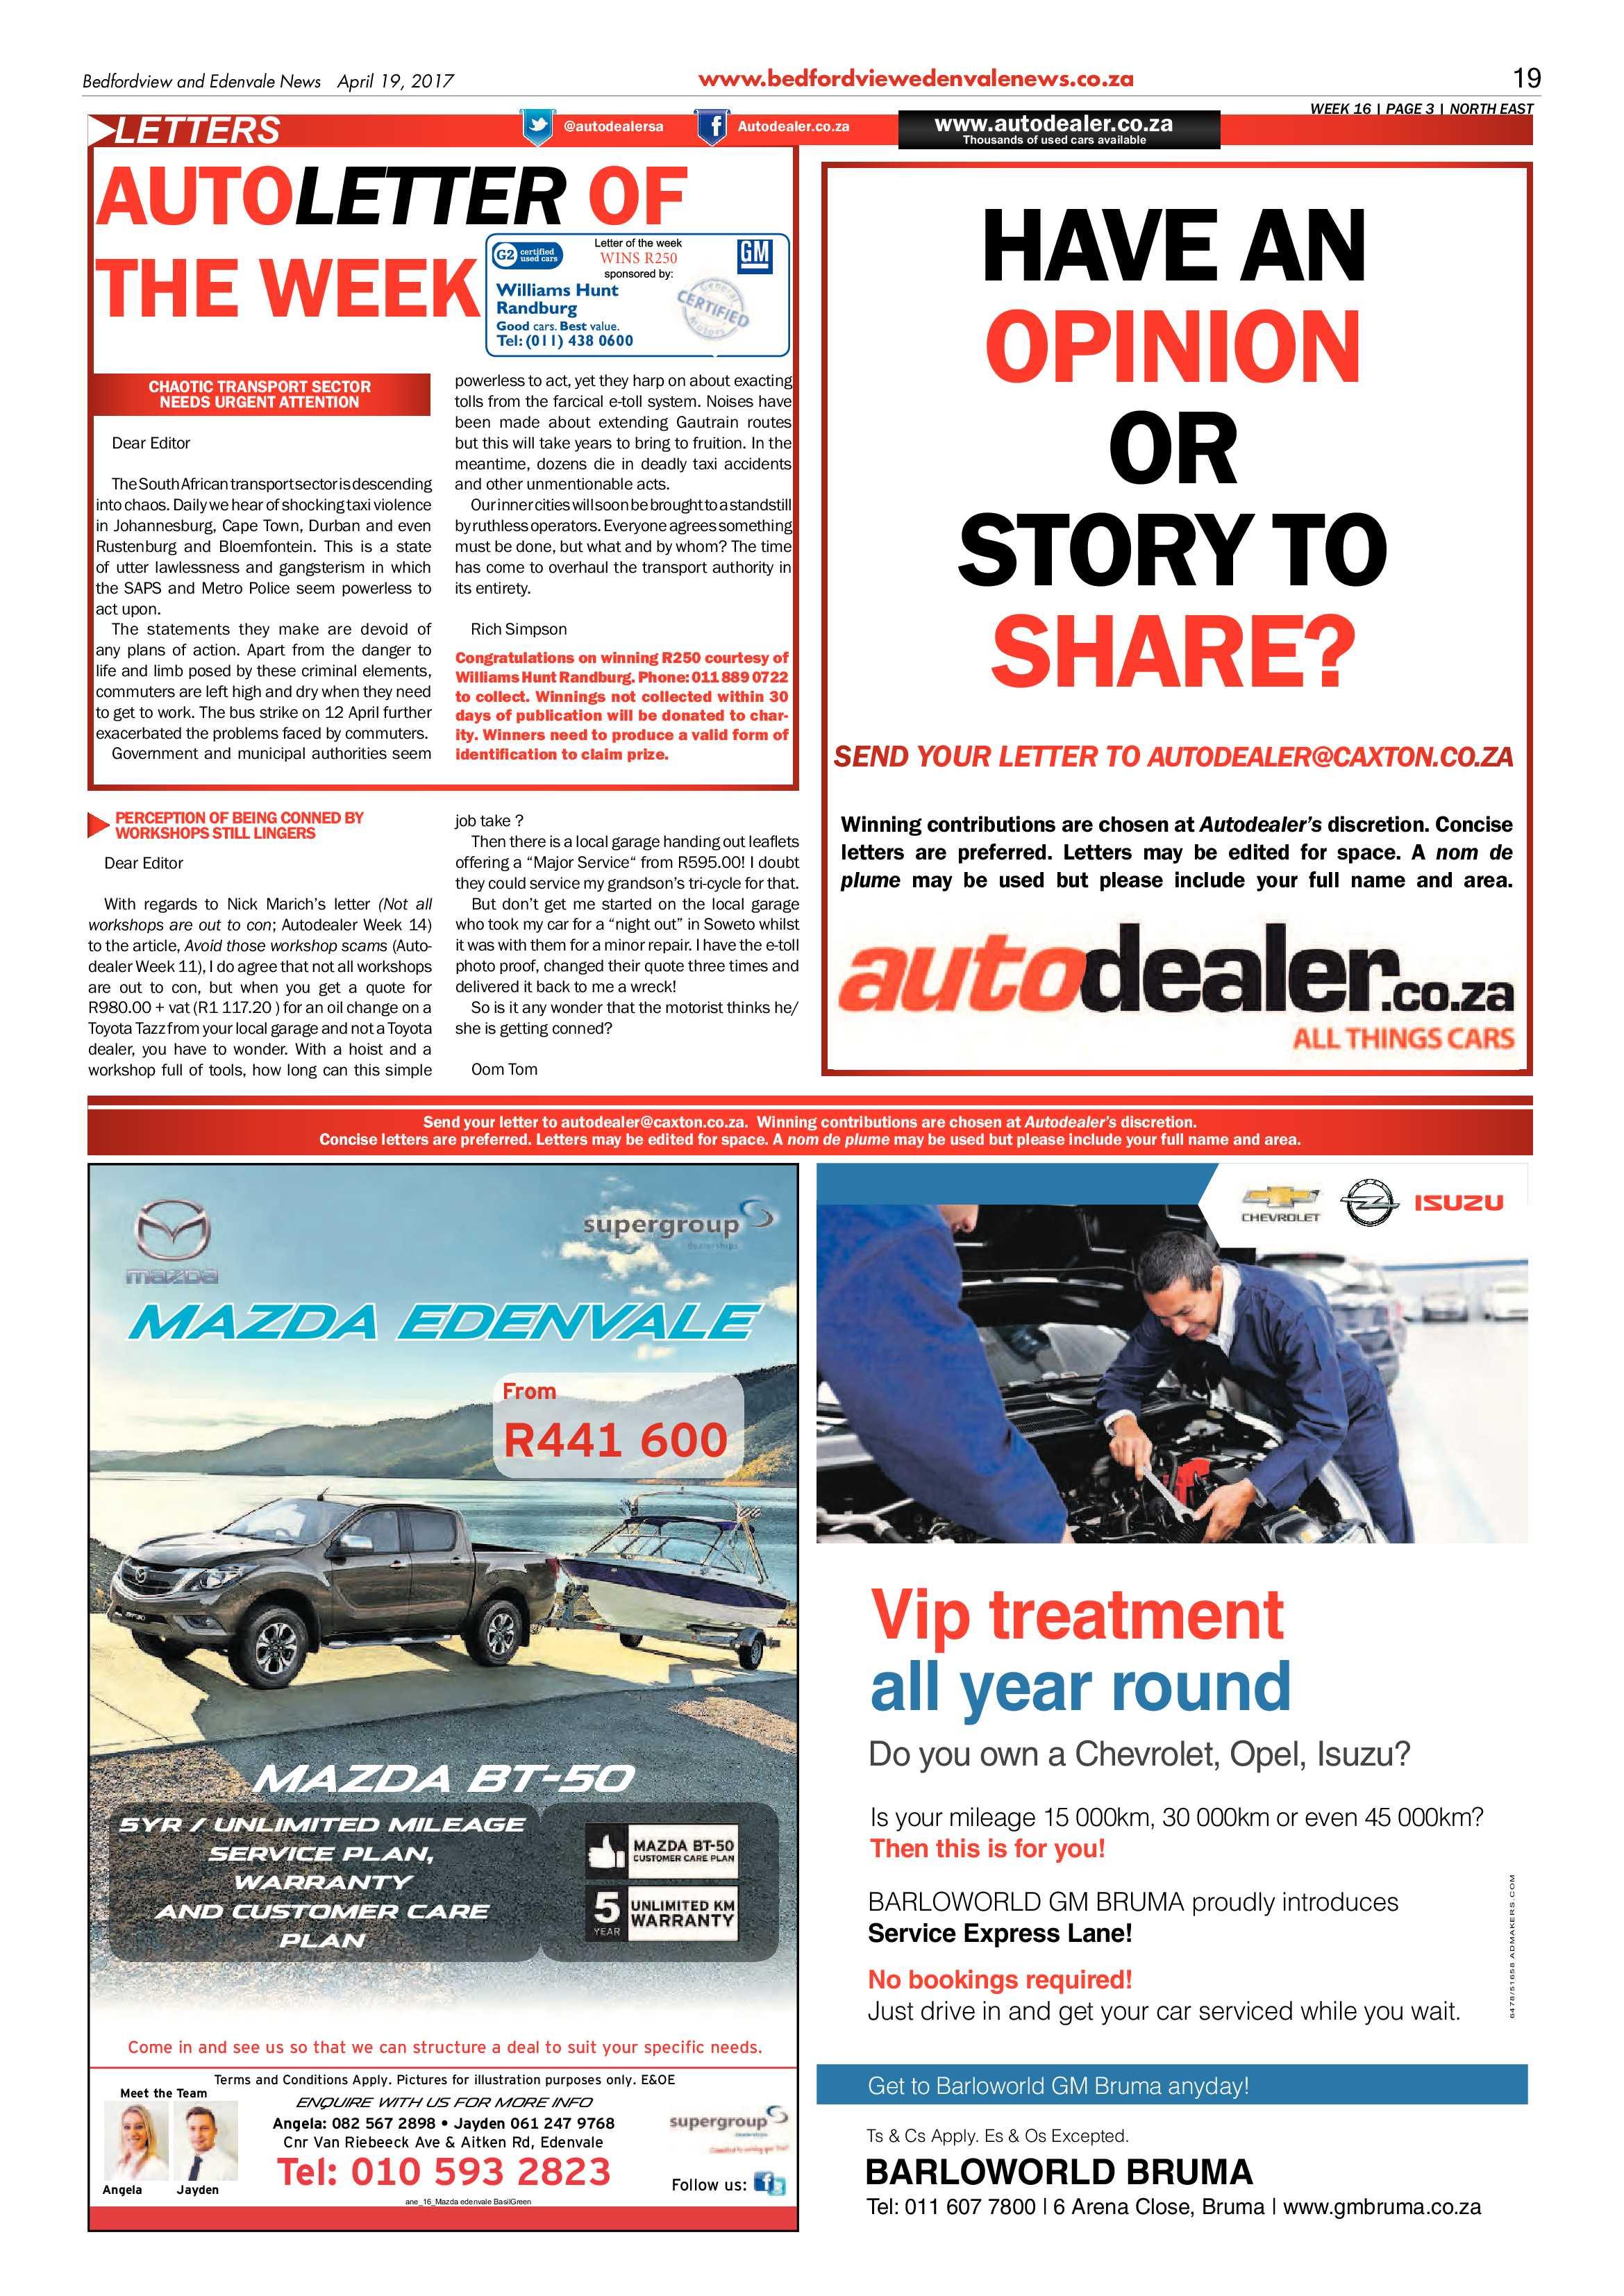 bedfordview-edenvale-news-19-april-2017-epapers-page-19